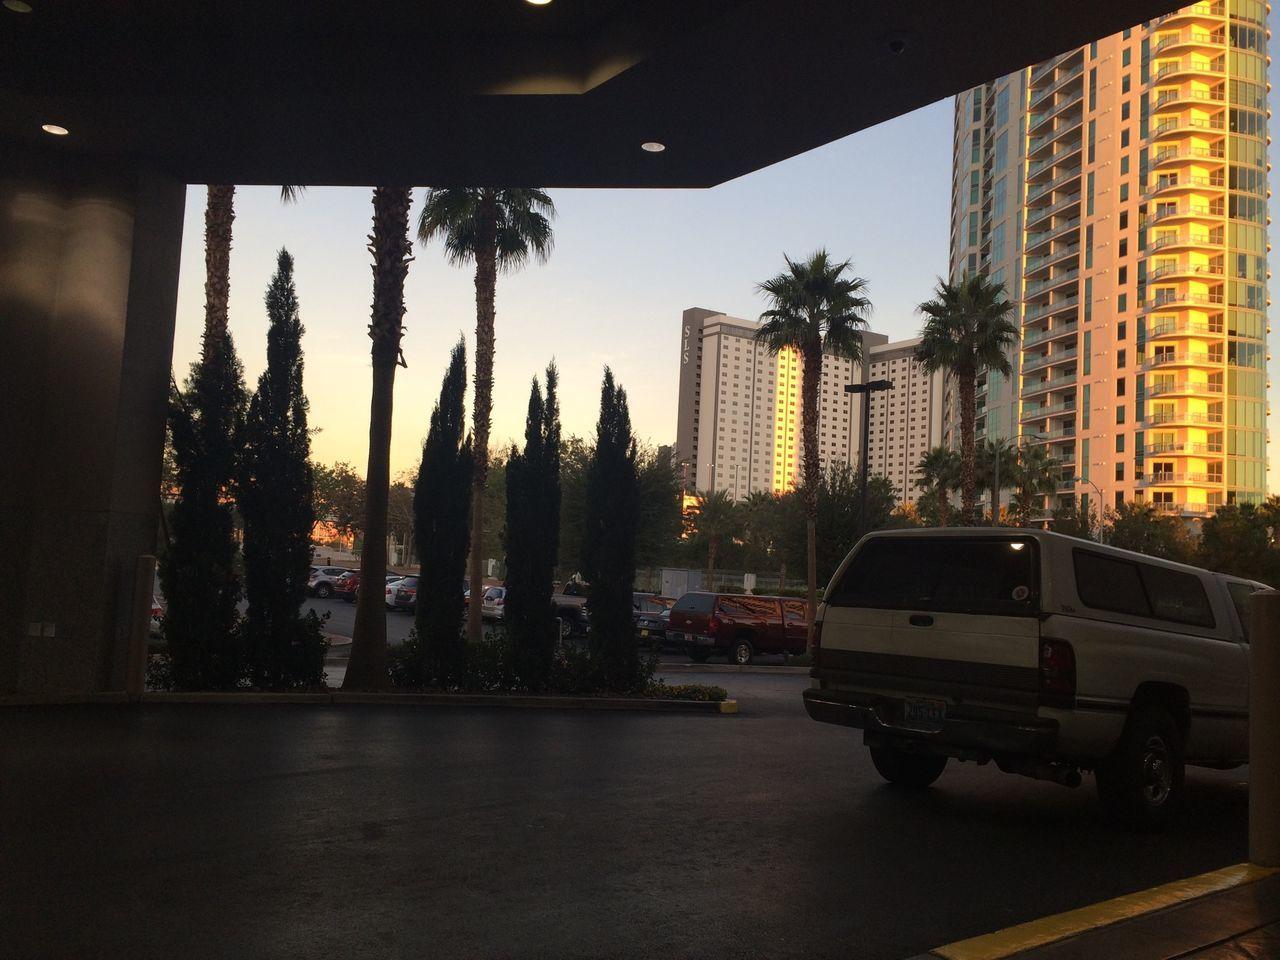 Sunrise Las Vegas Early Start Streetphotography